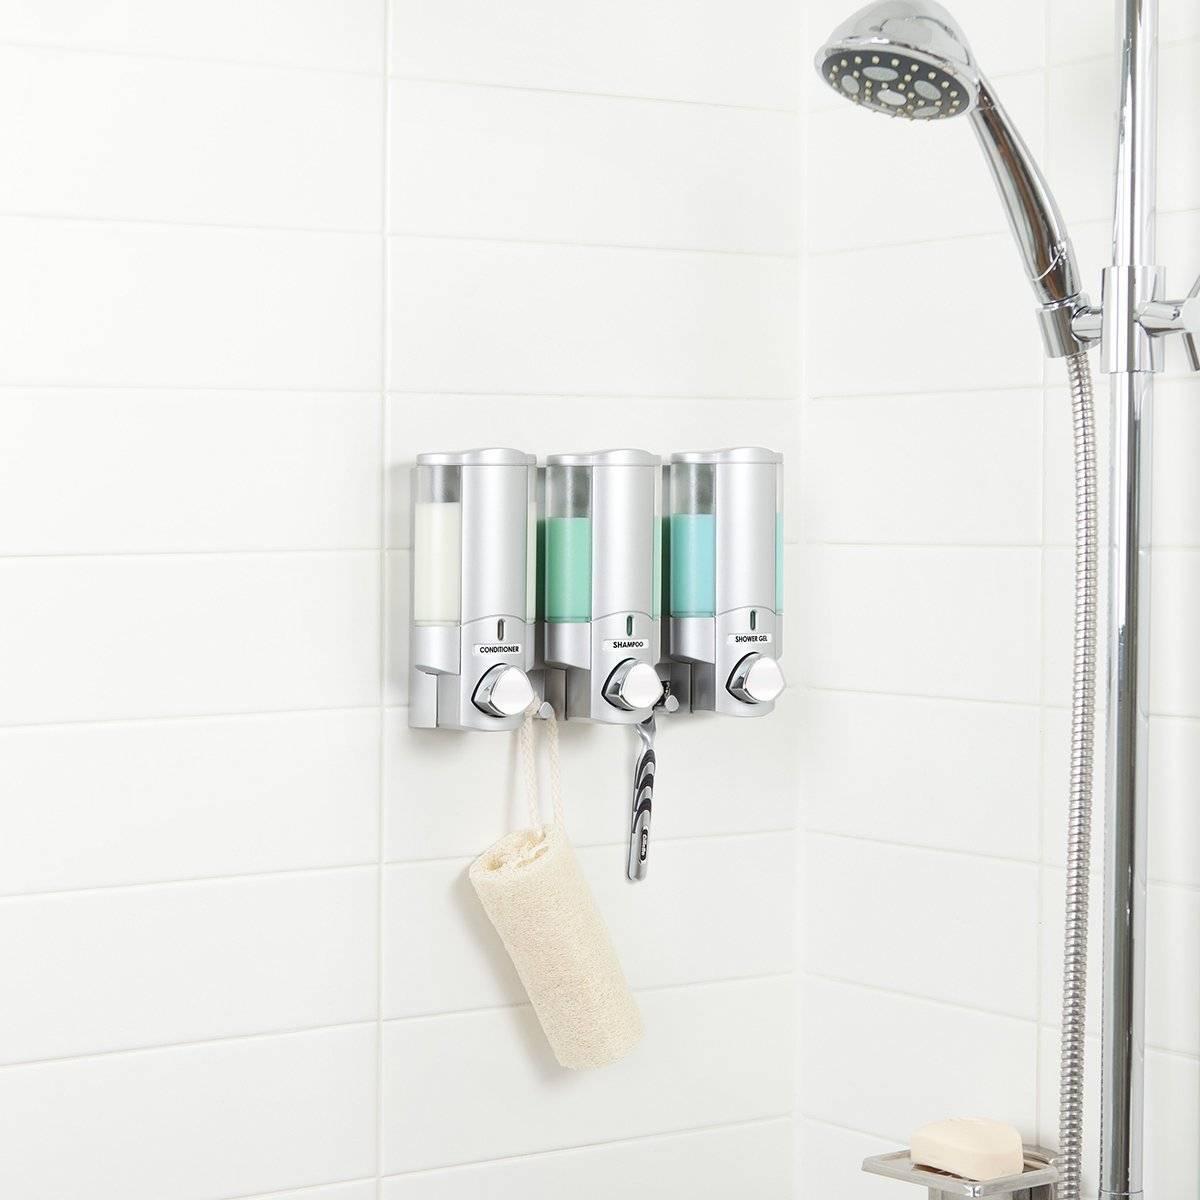 Bathroom Shower Dispenser Pump Liquid Soap Shampoo Holder Wall Mount ...